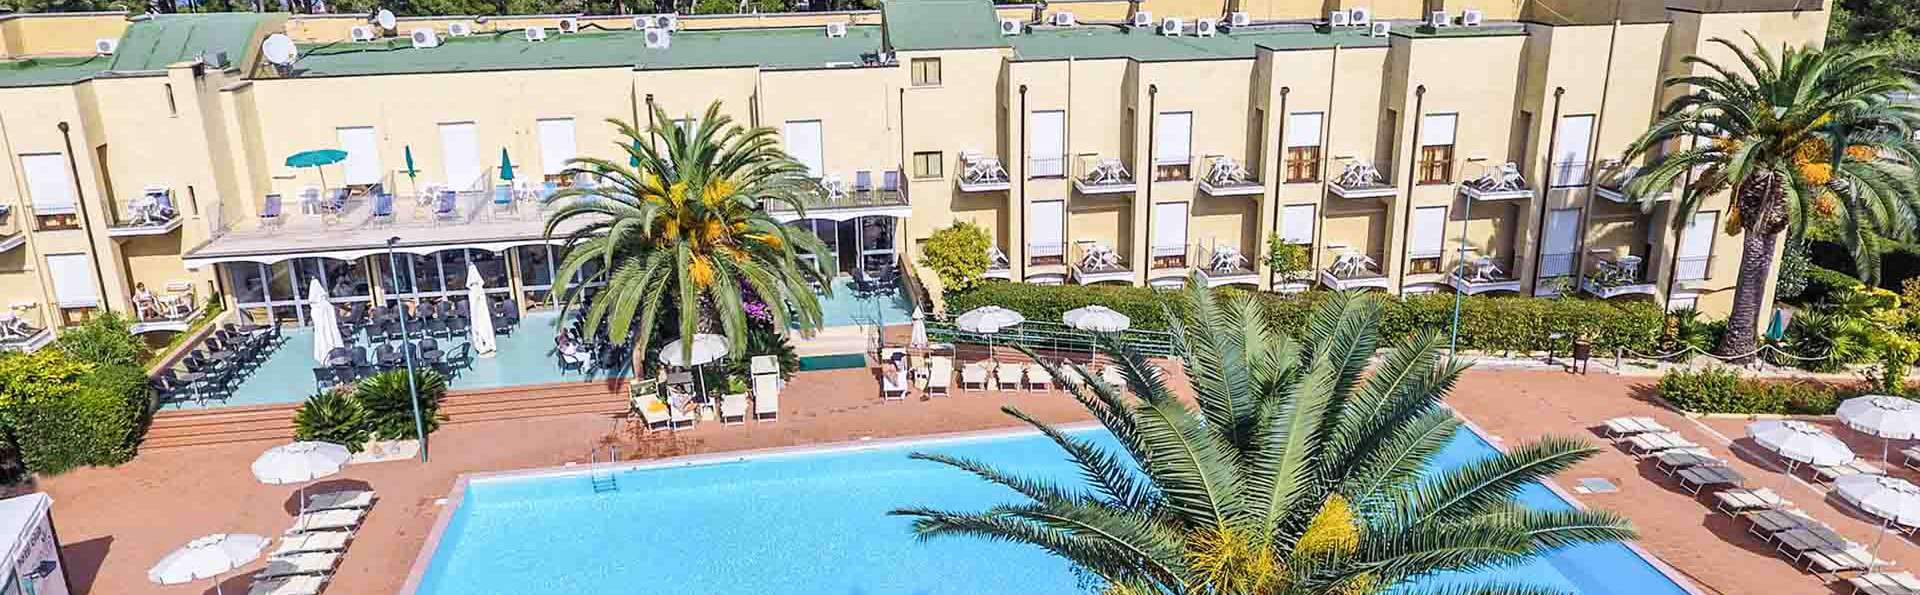 Hotel & Residence Le Acacie - EDIT_hotel_acacie_elba_01.jpg